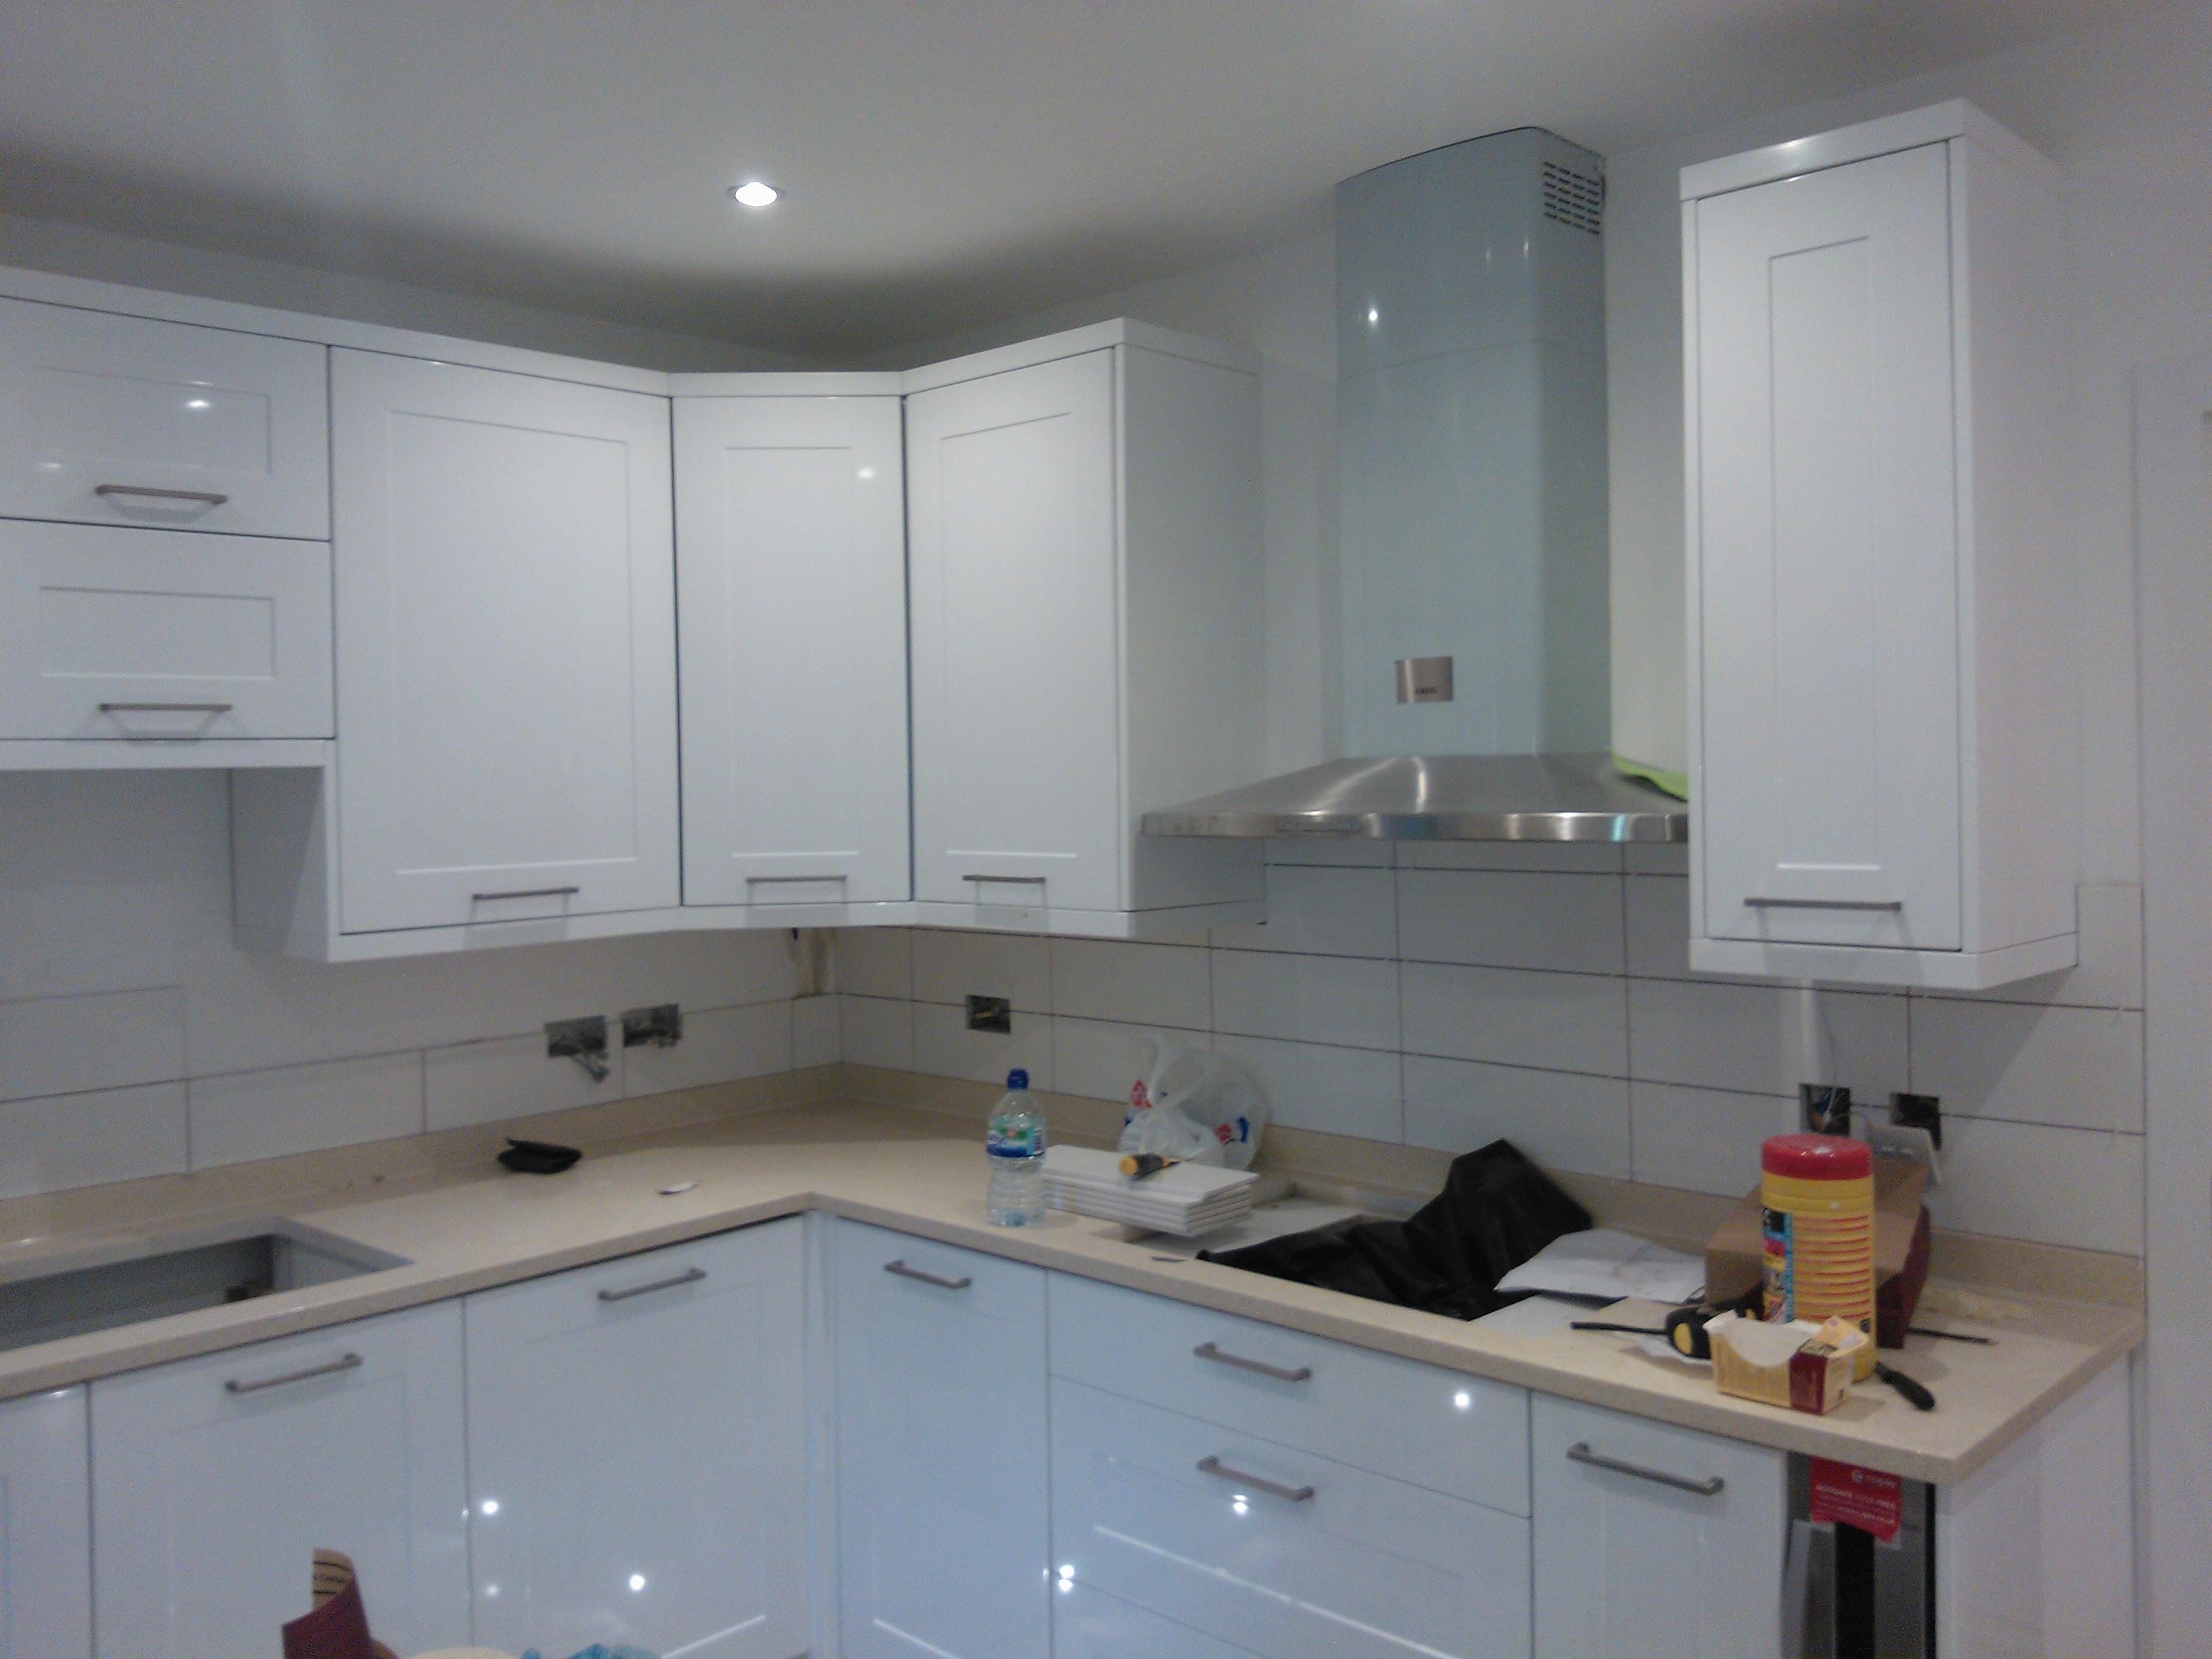 Finchley_Flat refurbishement_ (21)